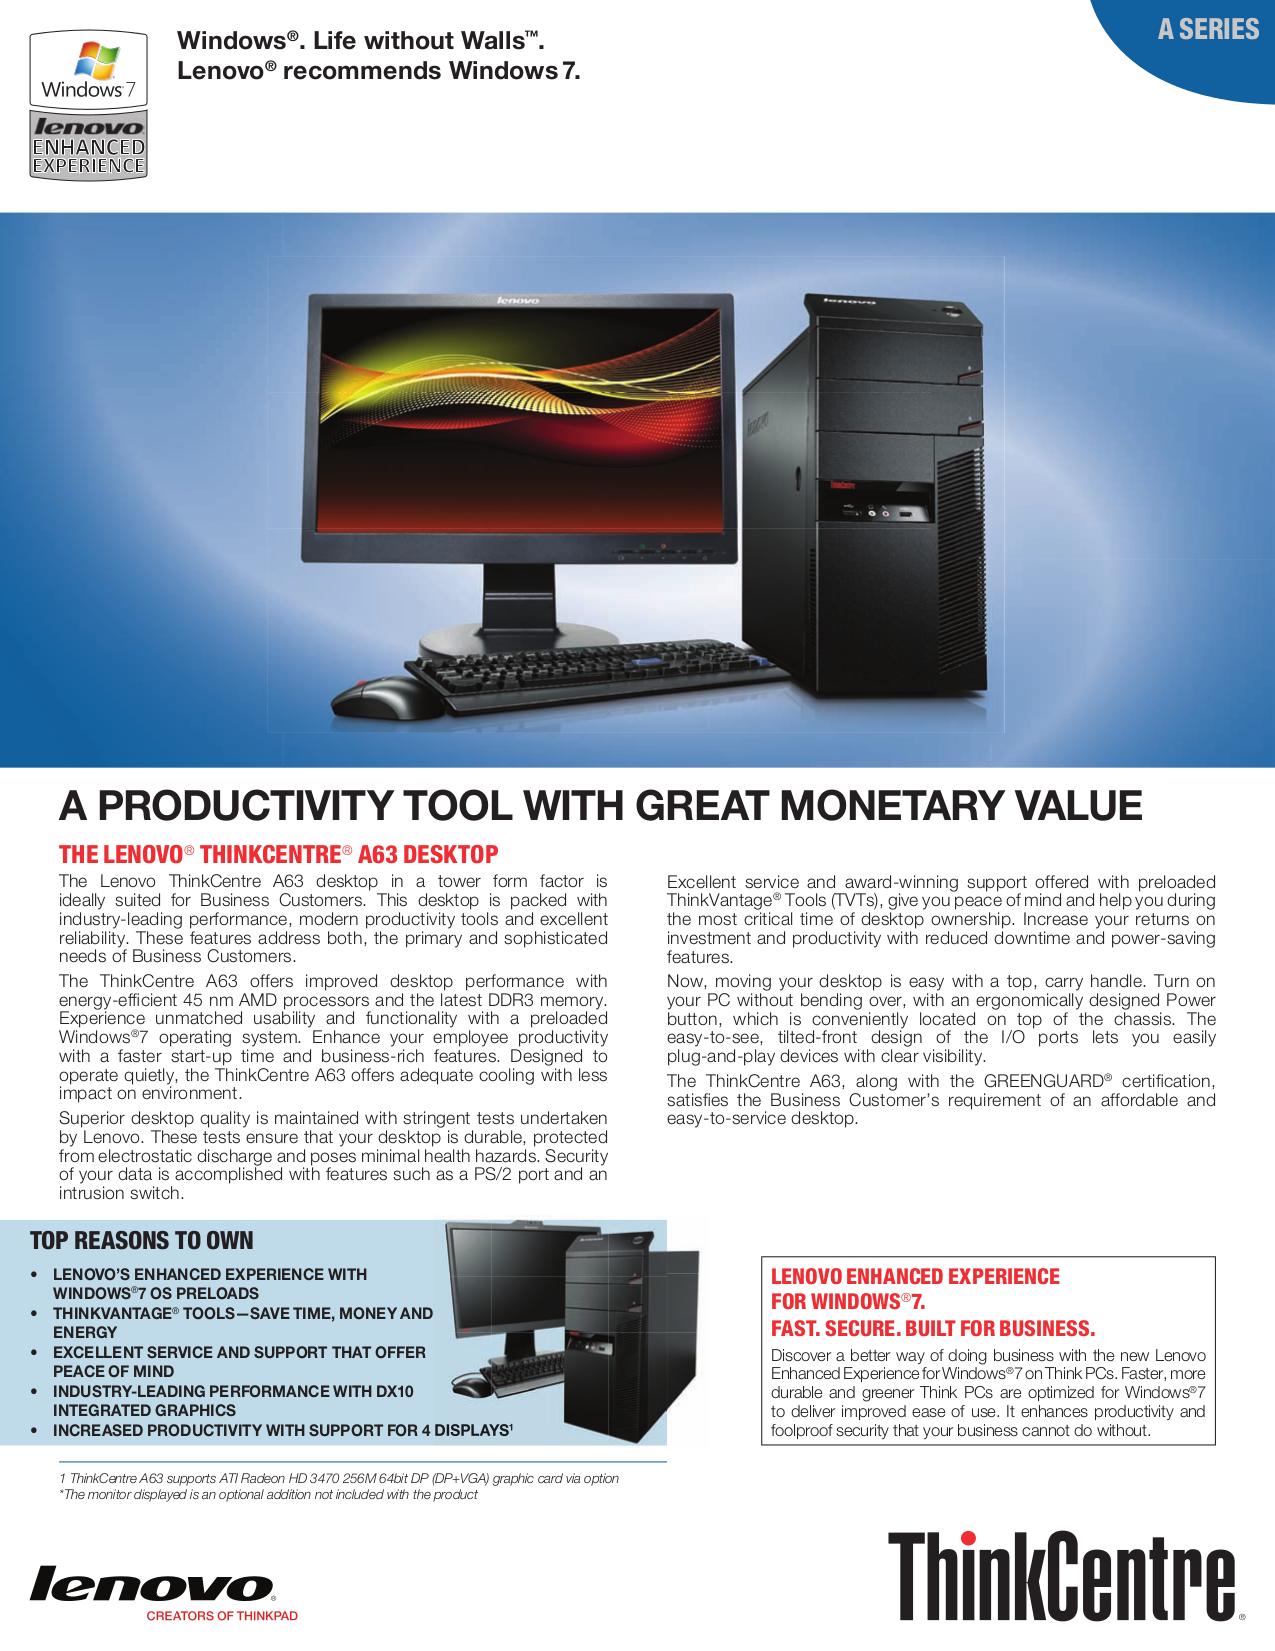 pdf for Lenovo Desktop ThinkCentre A63 6674 manual